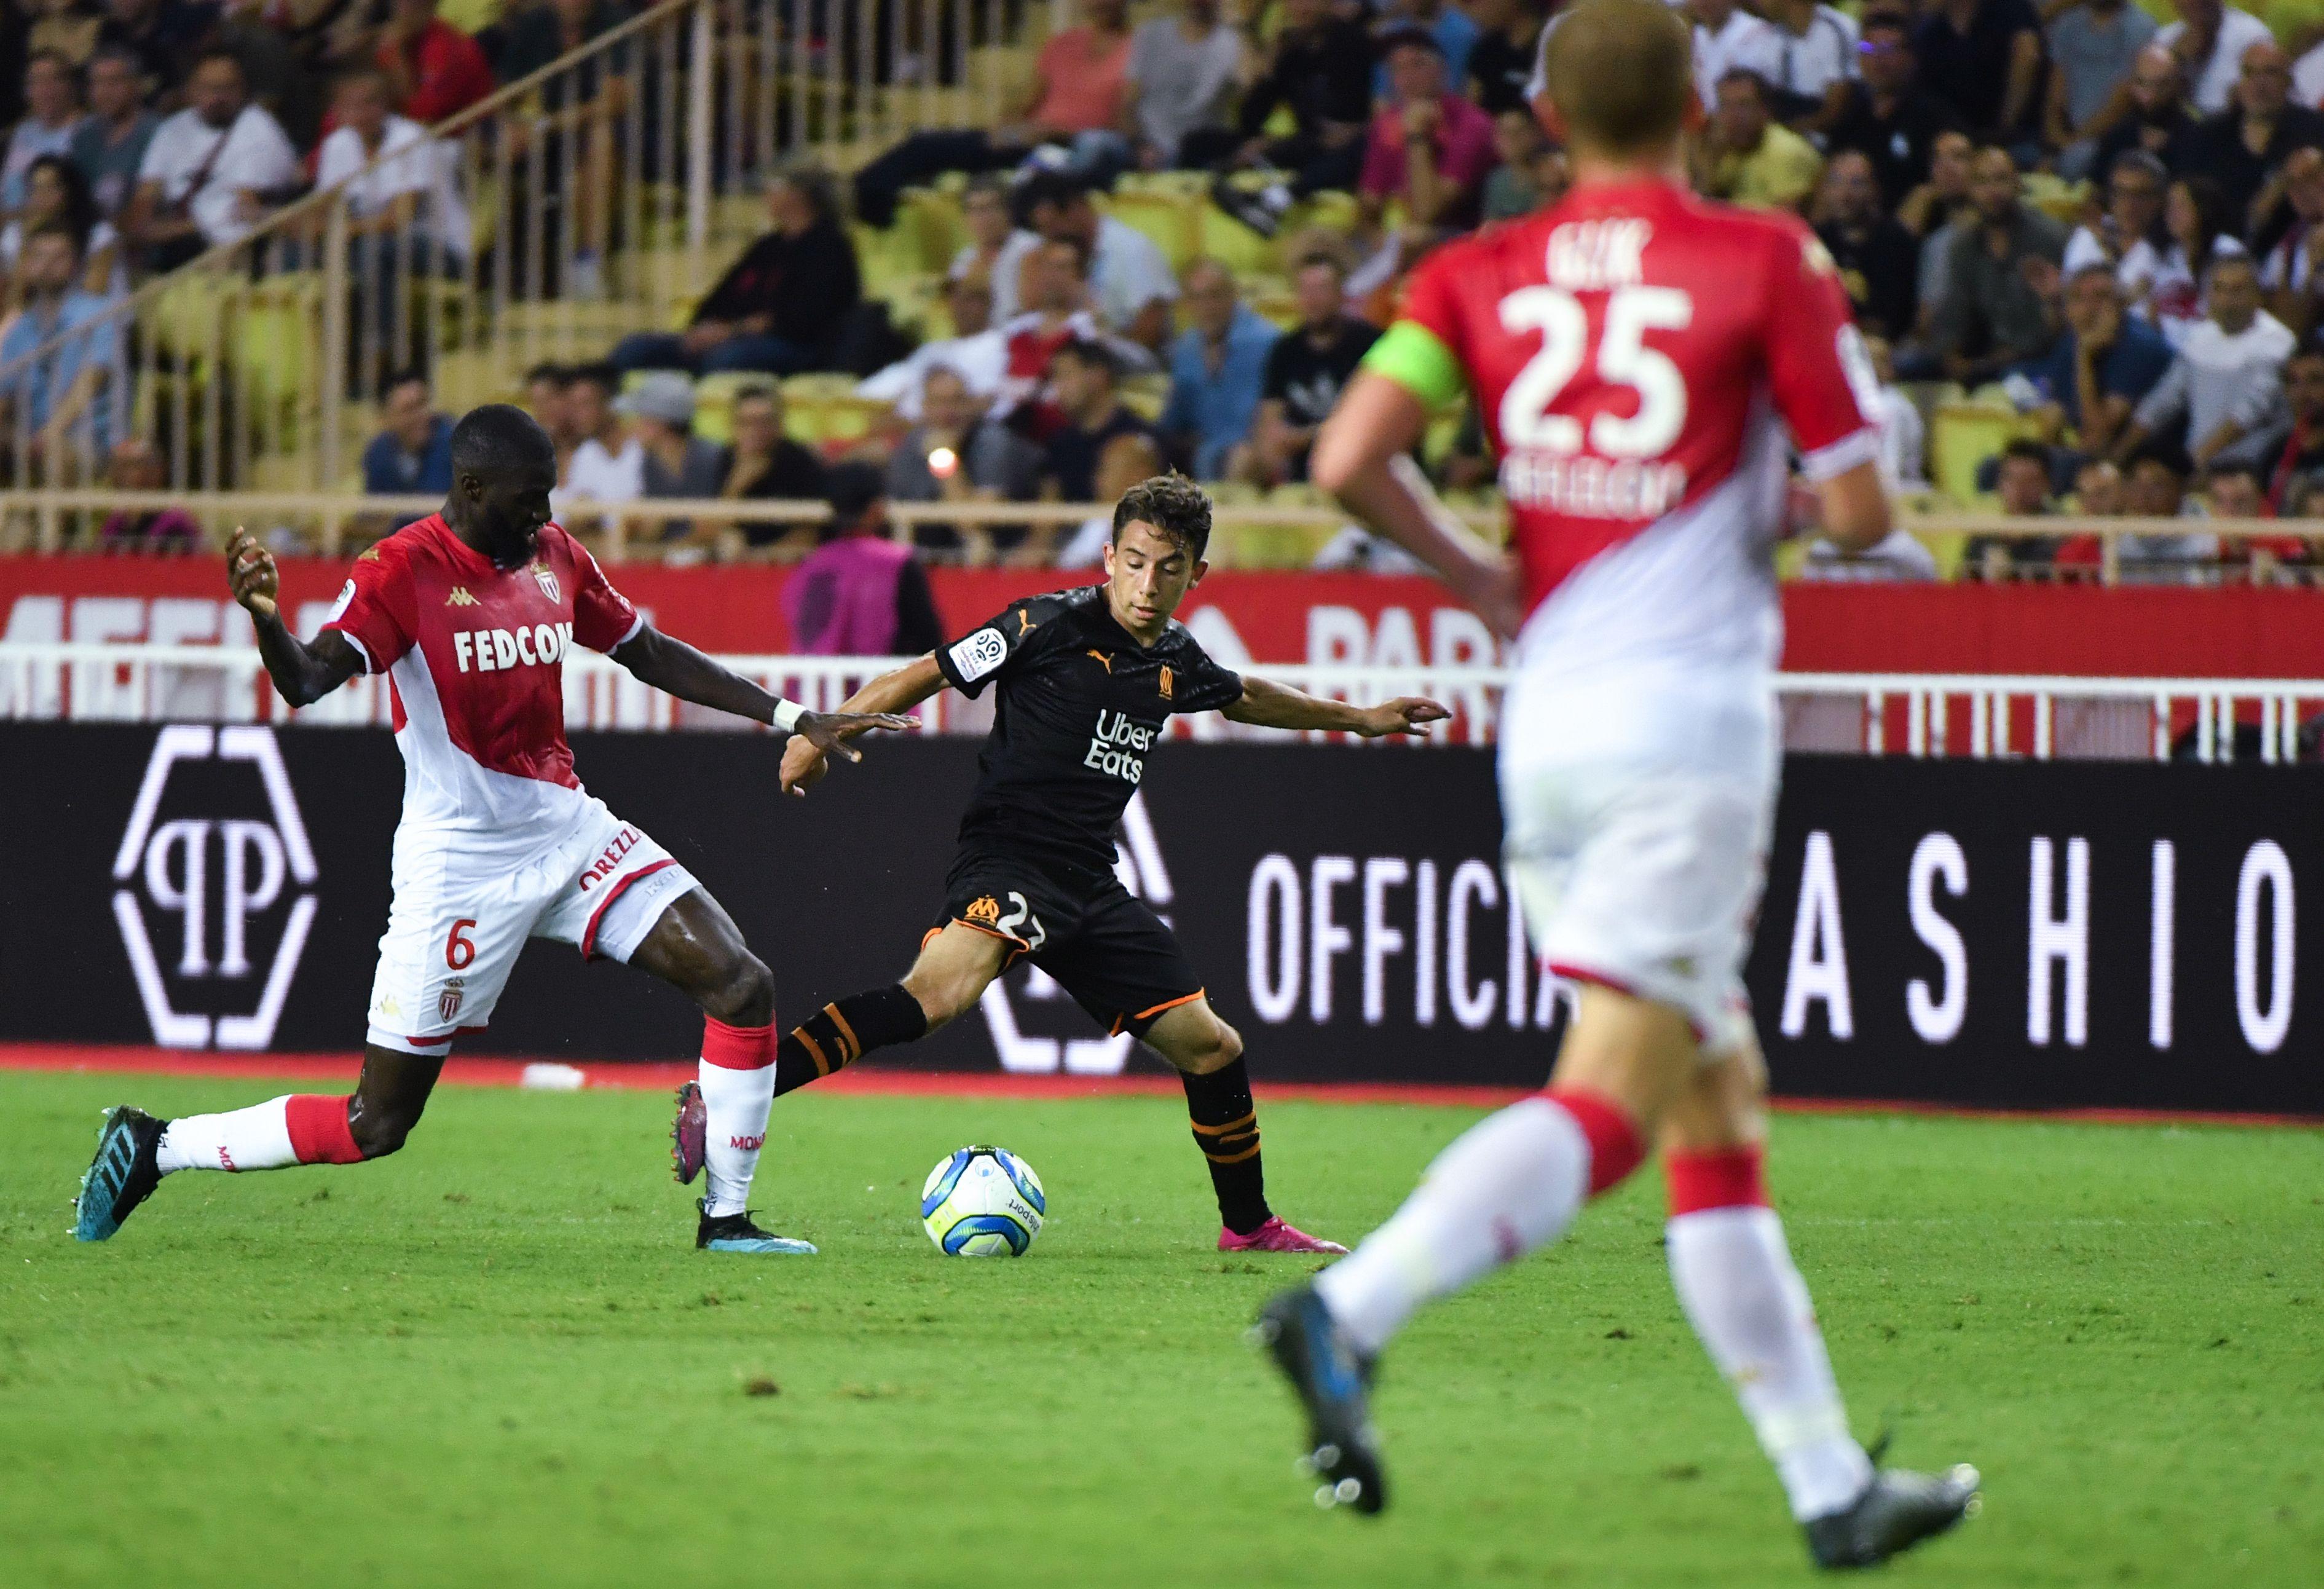 Monaco-Marseille (3-4) - L'OM renverse Monaco au terme d'un scénario fou